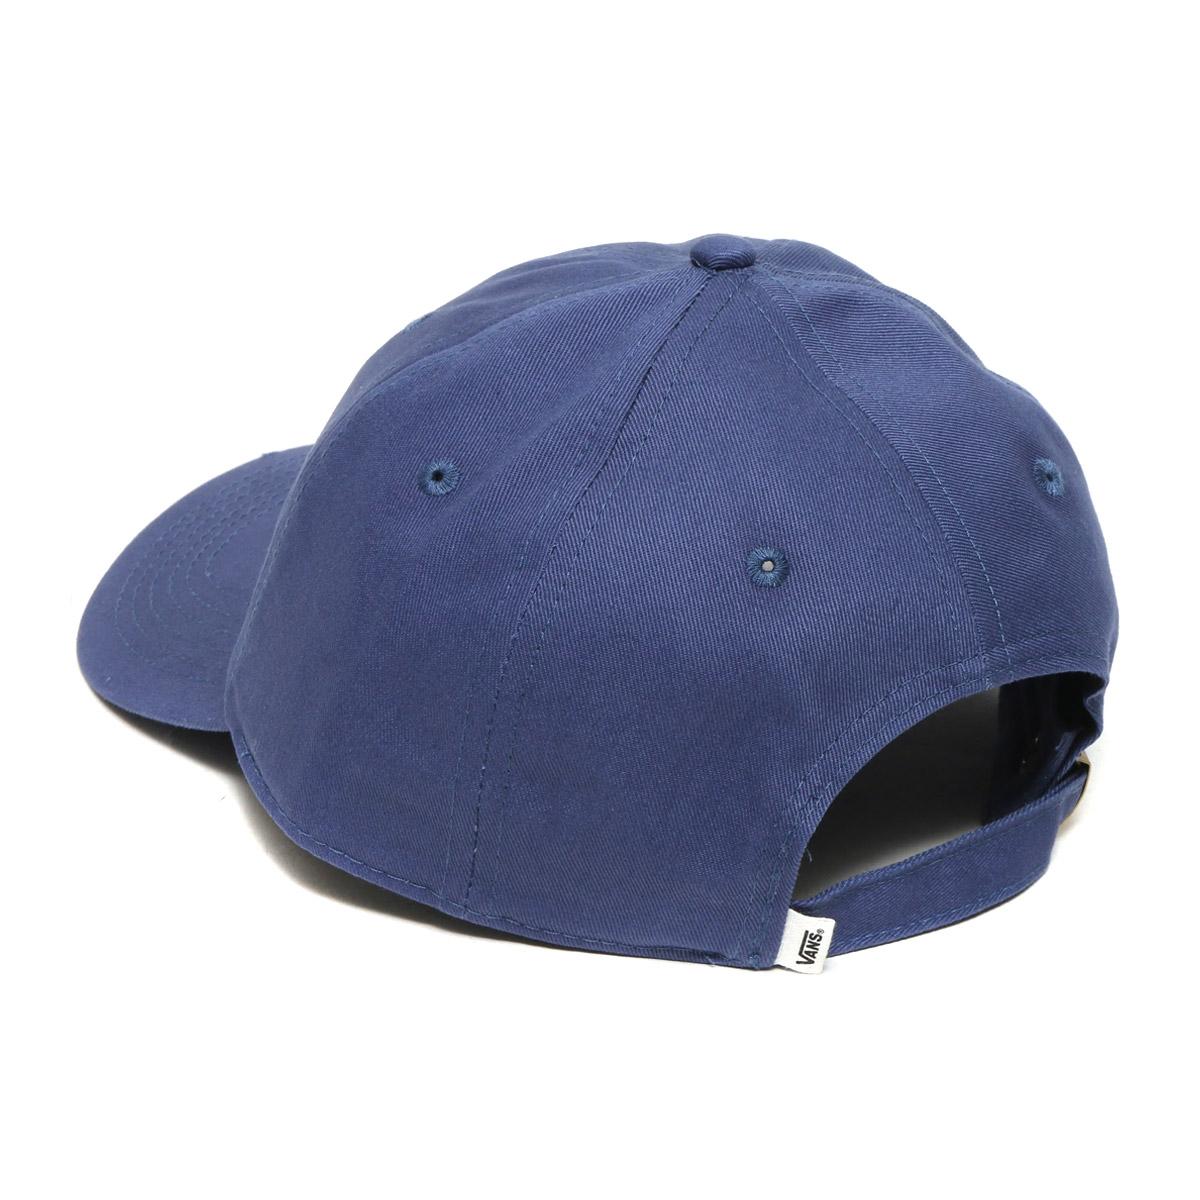 VANS VANS X PEANUTS COURT SIDE BASEBALL HAT (vans X peanut courtside  baseball cap) NAVY 17SU-I c2718f71f1fb